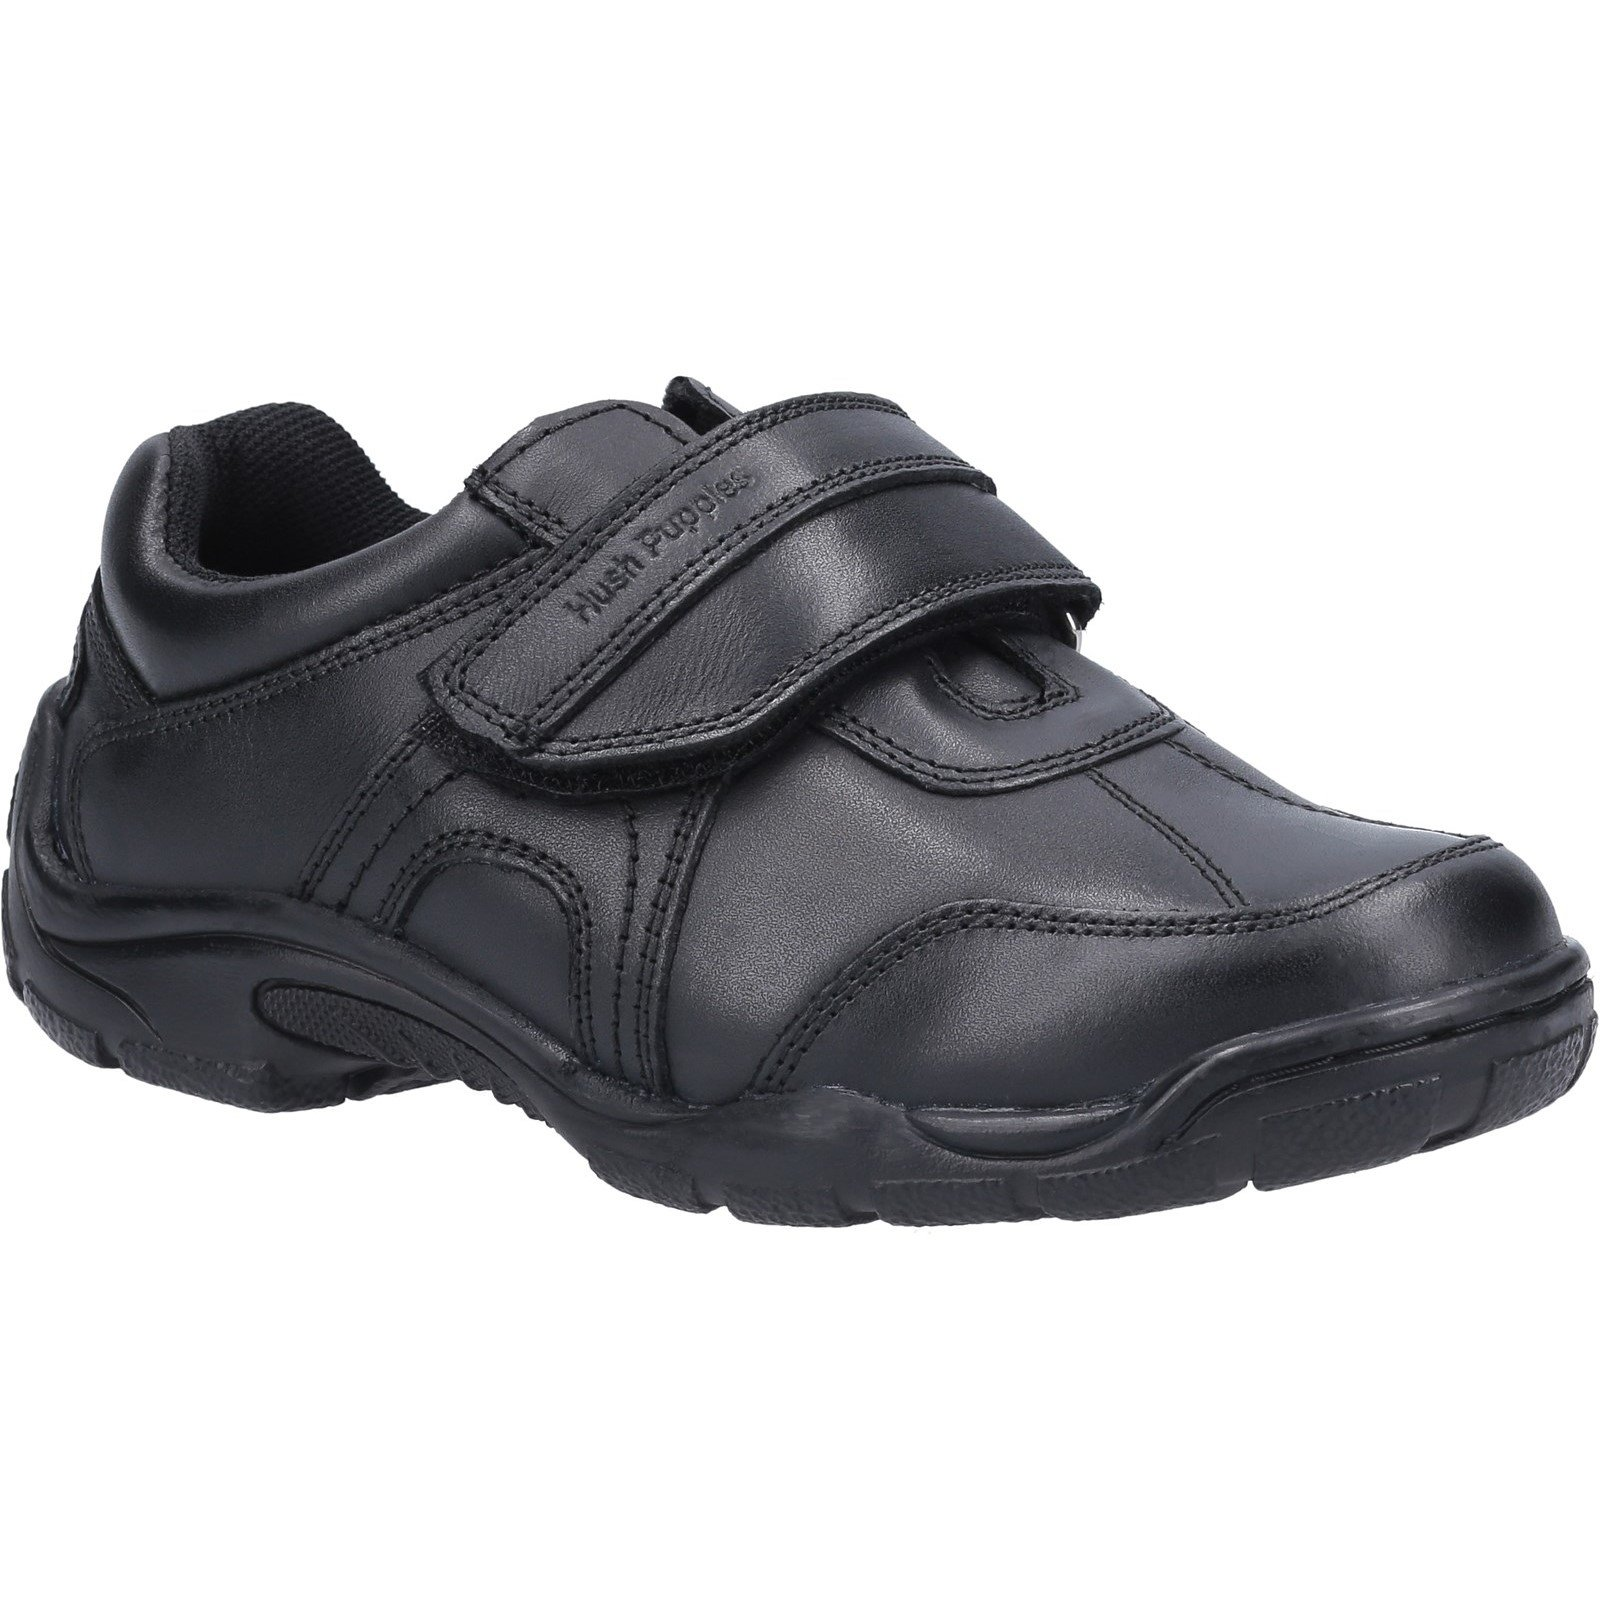 Hush Puppies Kid's Arlo Junior School Shoe Black 30853 - Black 13.5